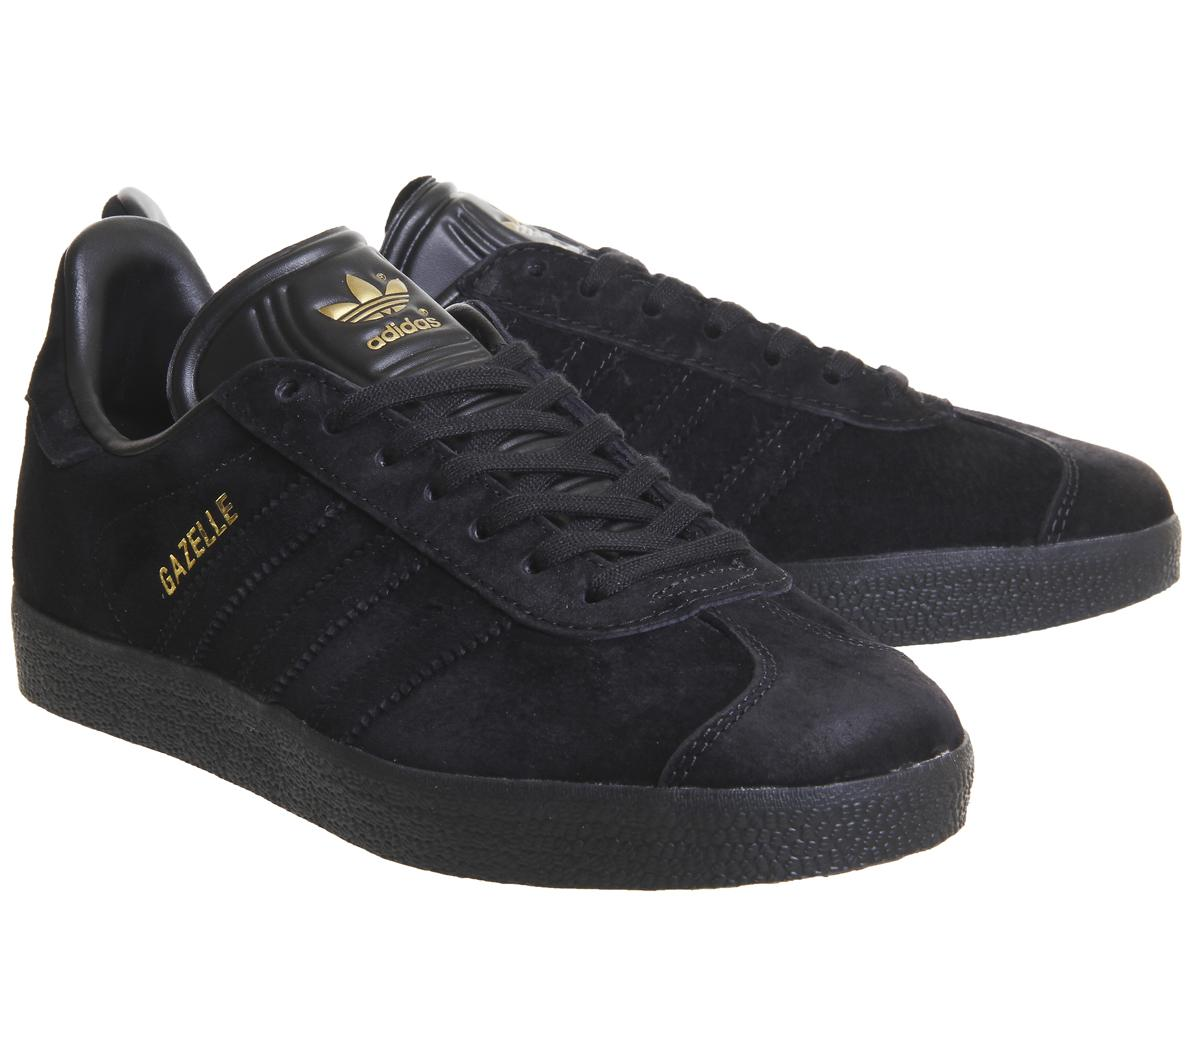 adidas Gazelle Black Gold Exclusive